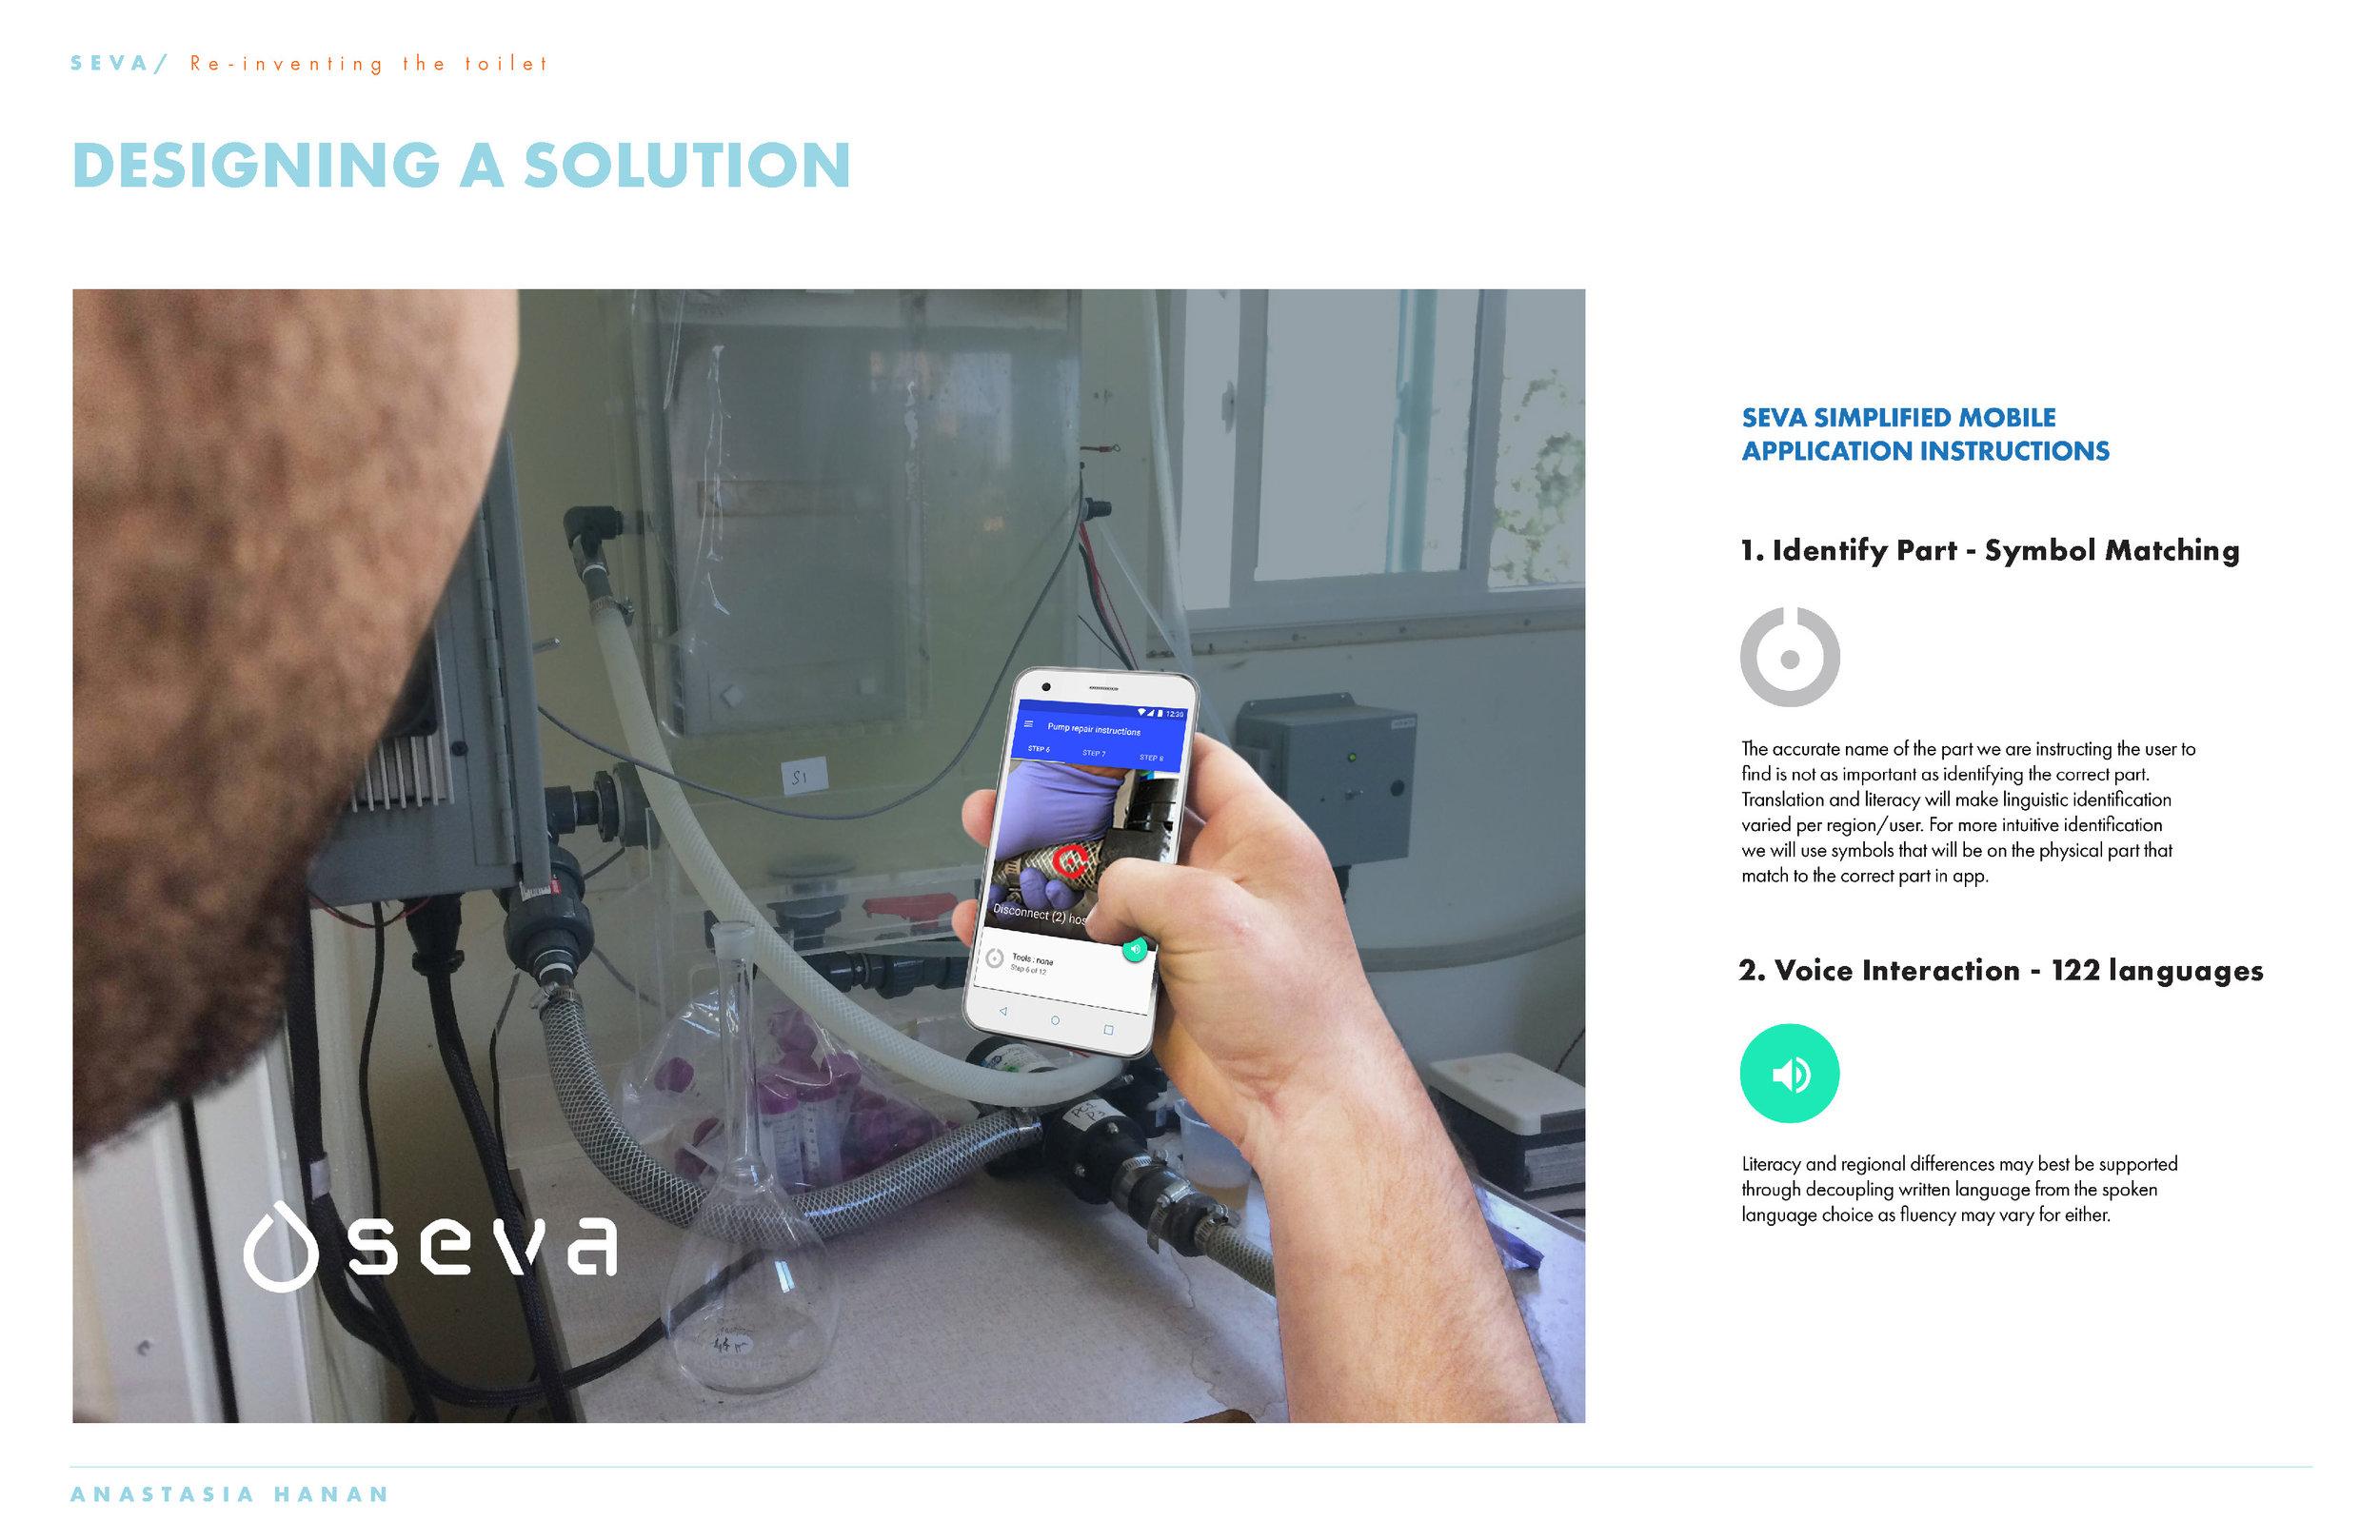 SEVA_toilets_processfinalV2_Page_34.jpg